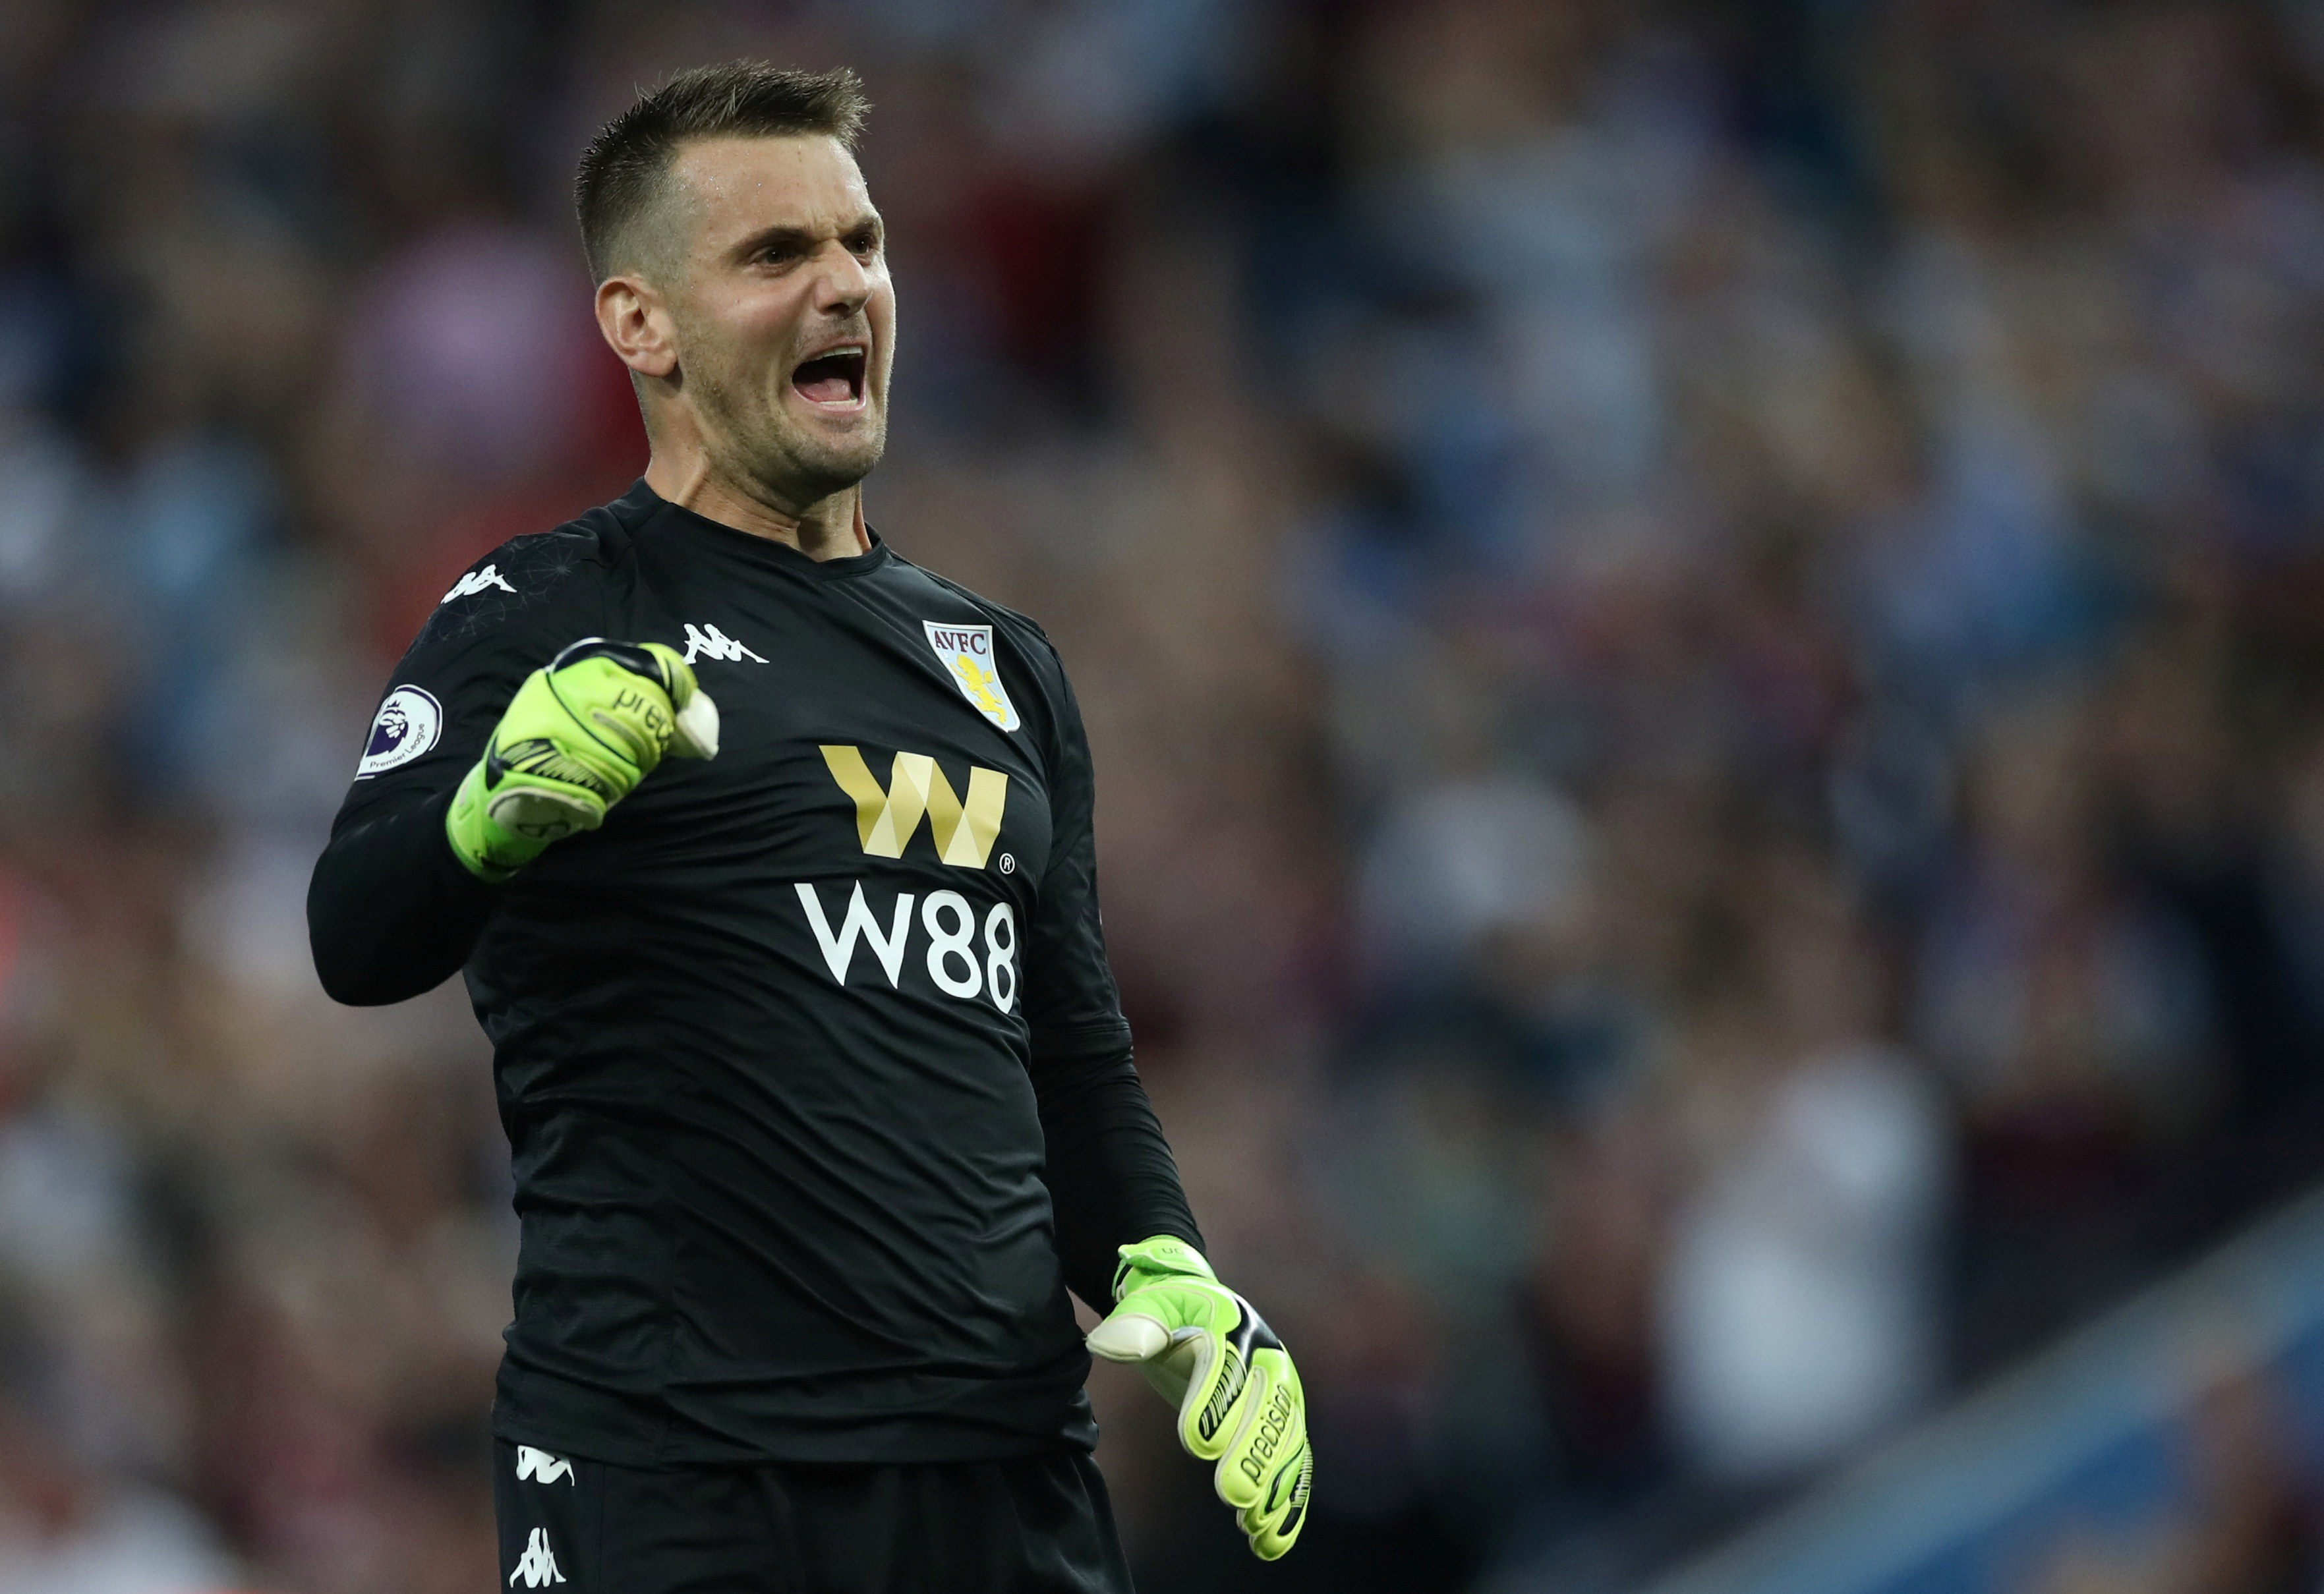 Aston Villa FC Squad 2021: Aston Villa FC first team all players 2020/21 1